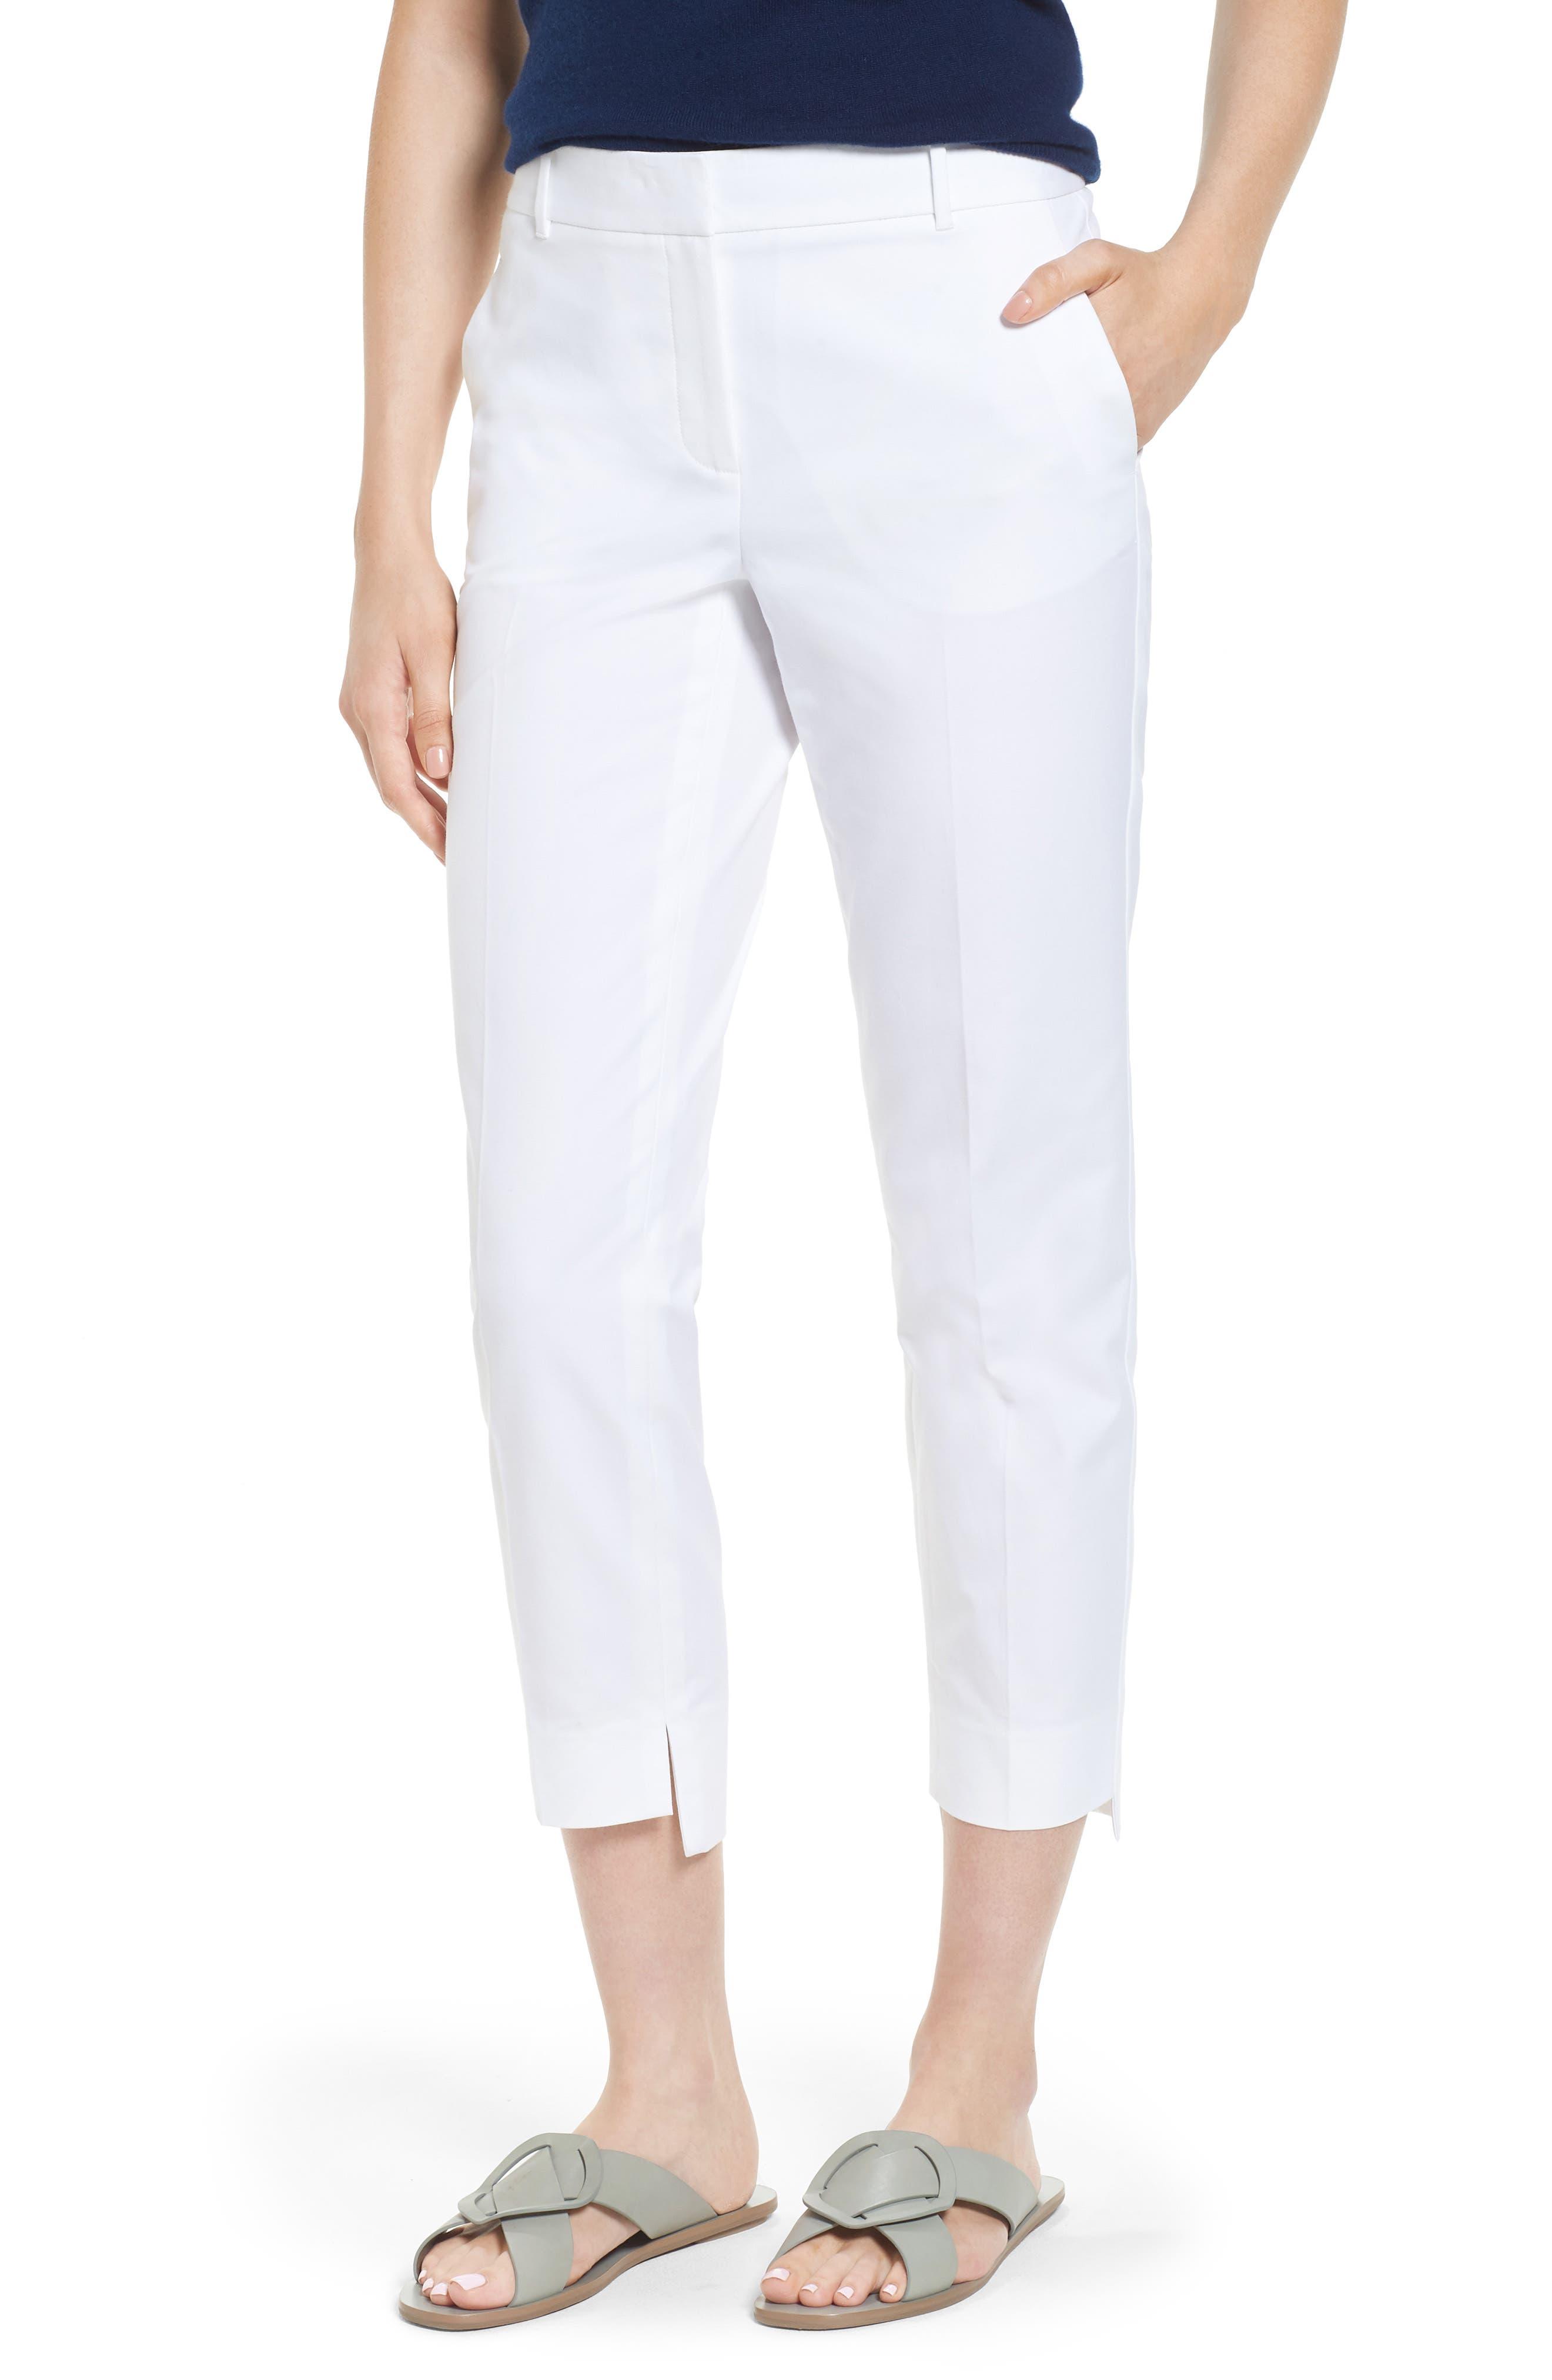 Nordstrom Signature High/Low Crop Pants